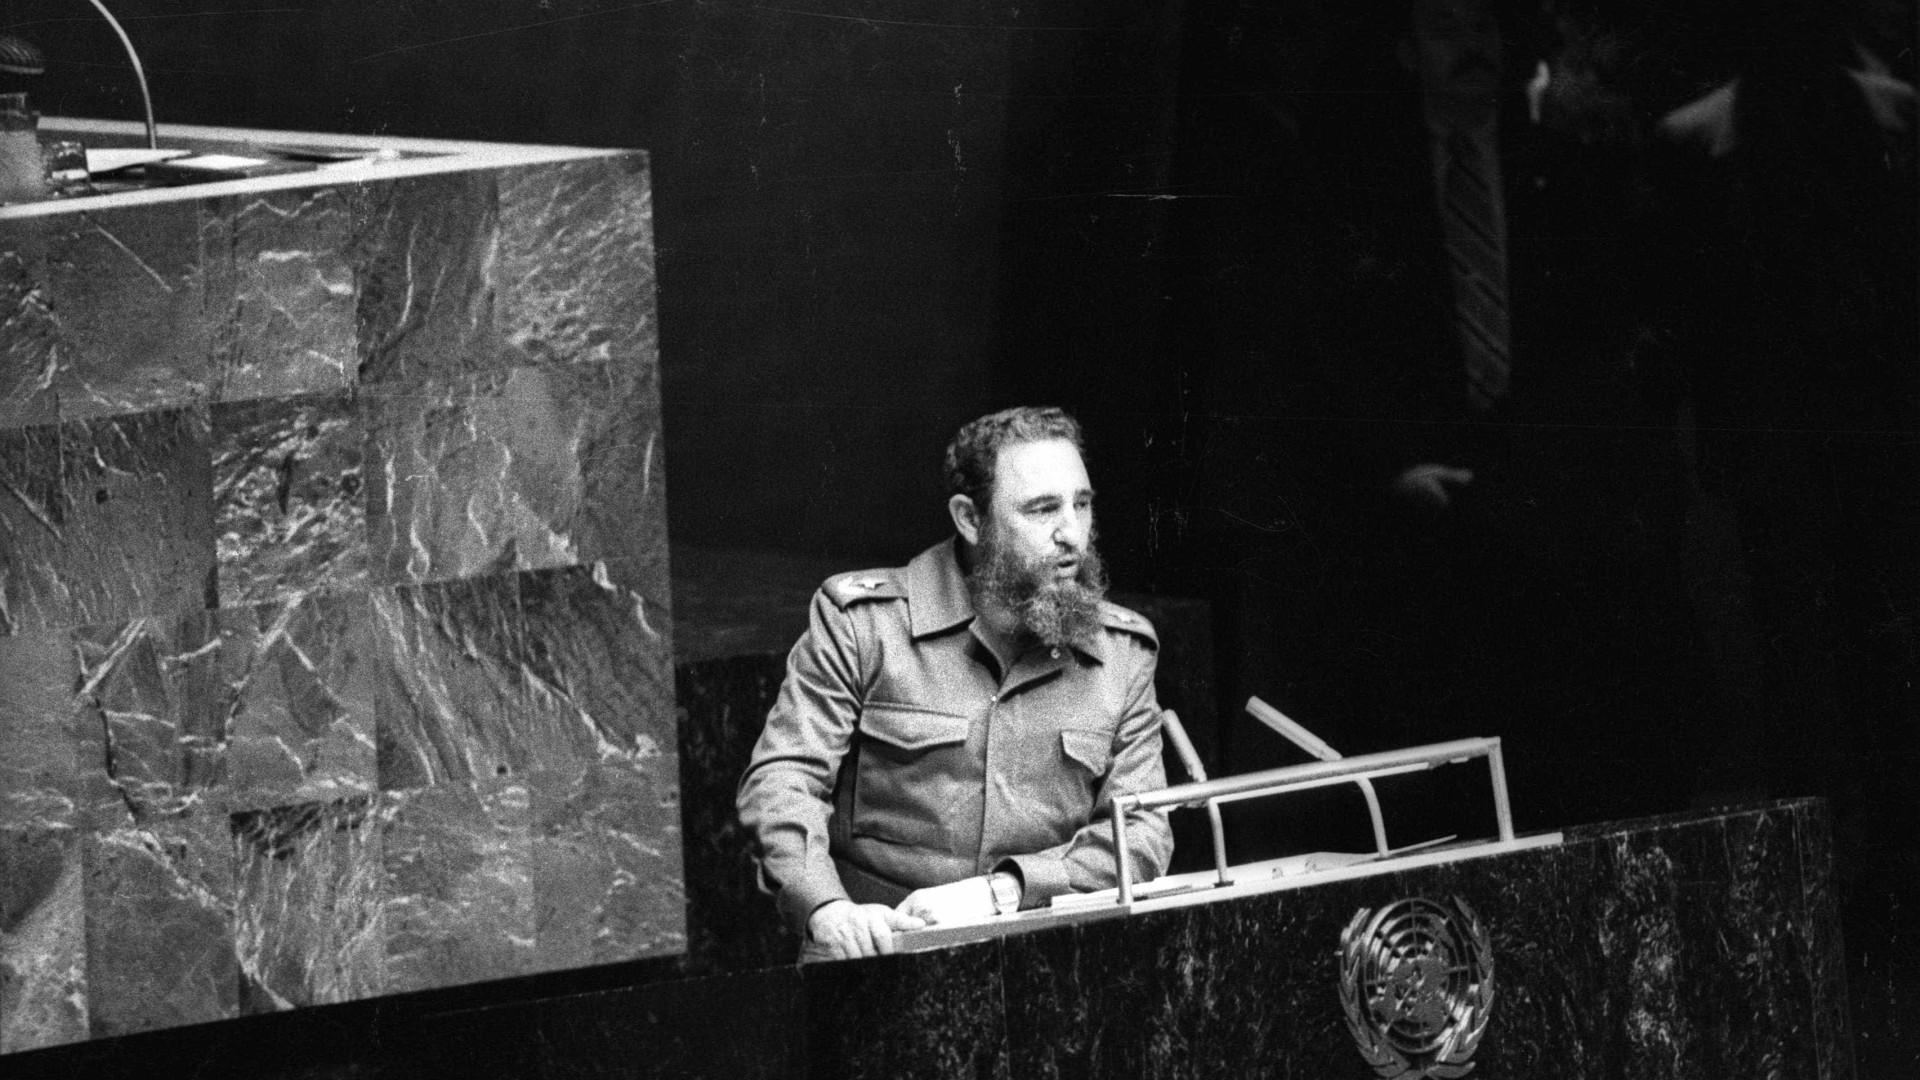 Os segredos que Fidel Castro levou para o túmulo